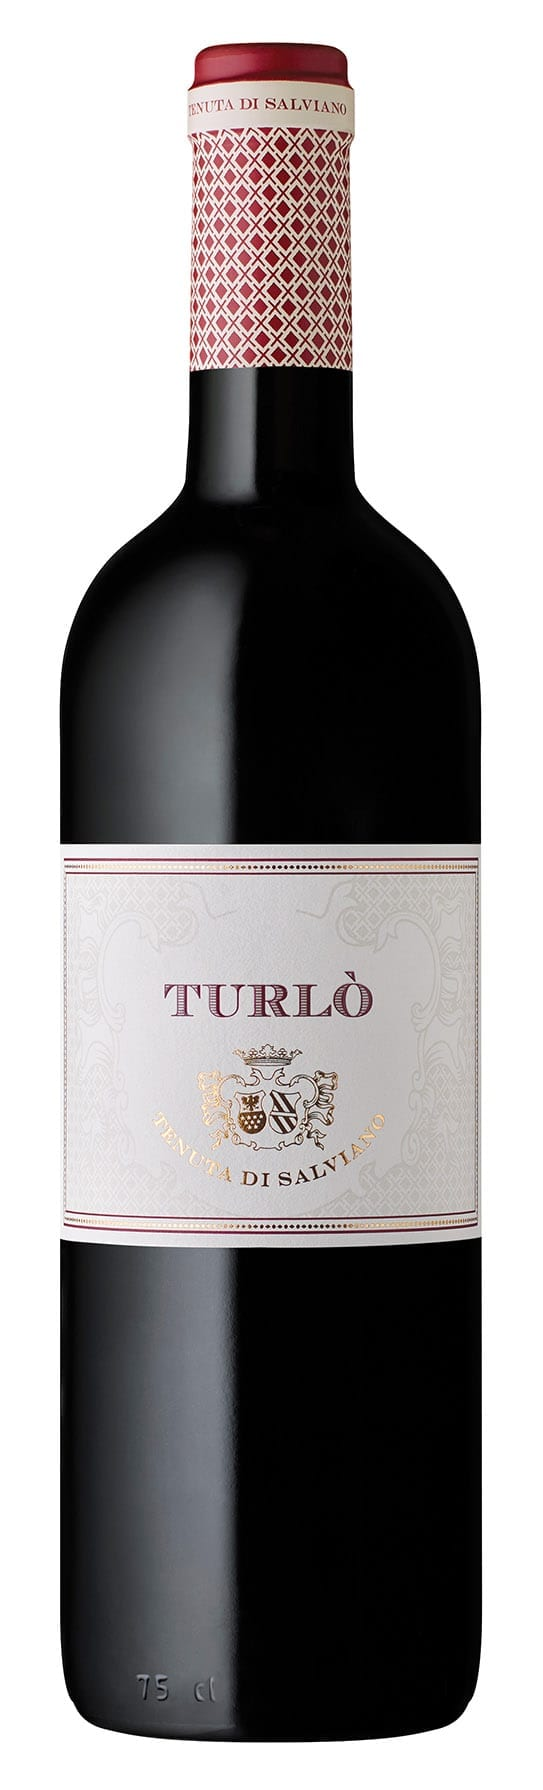 Italian wine bottle, red wine, Turlo, Salviano, Umbria